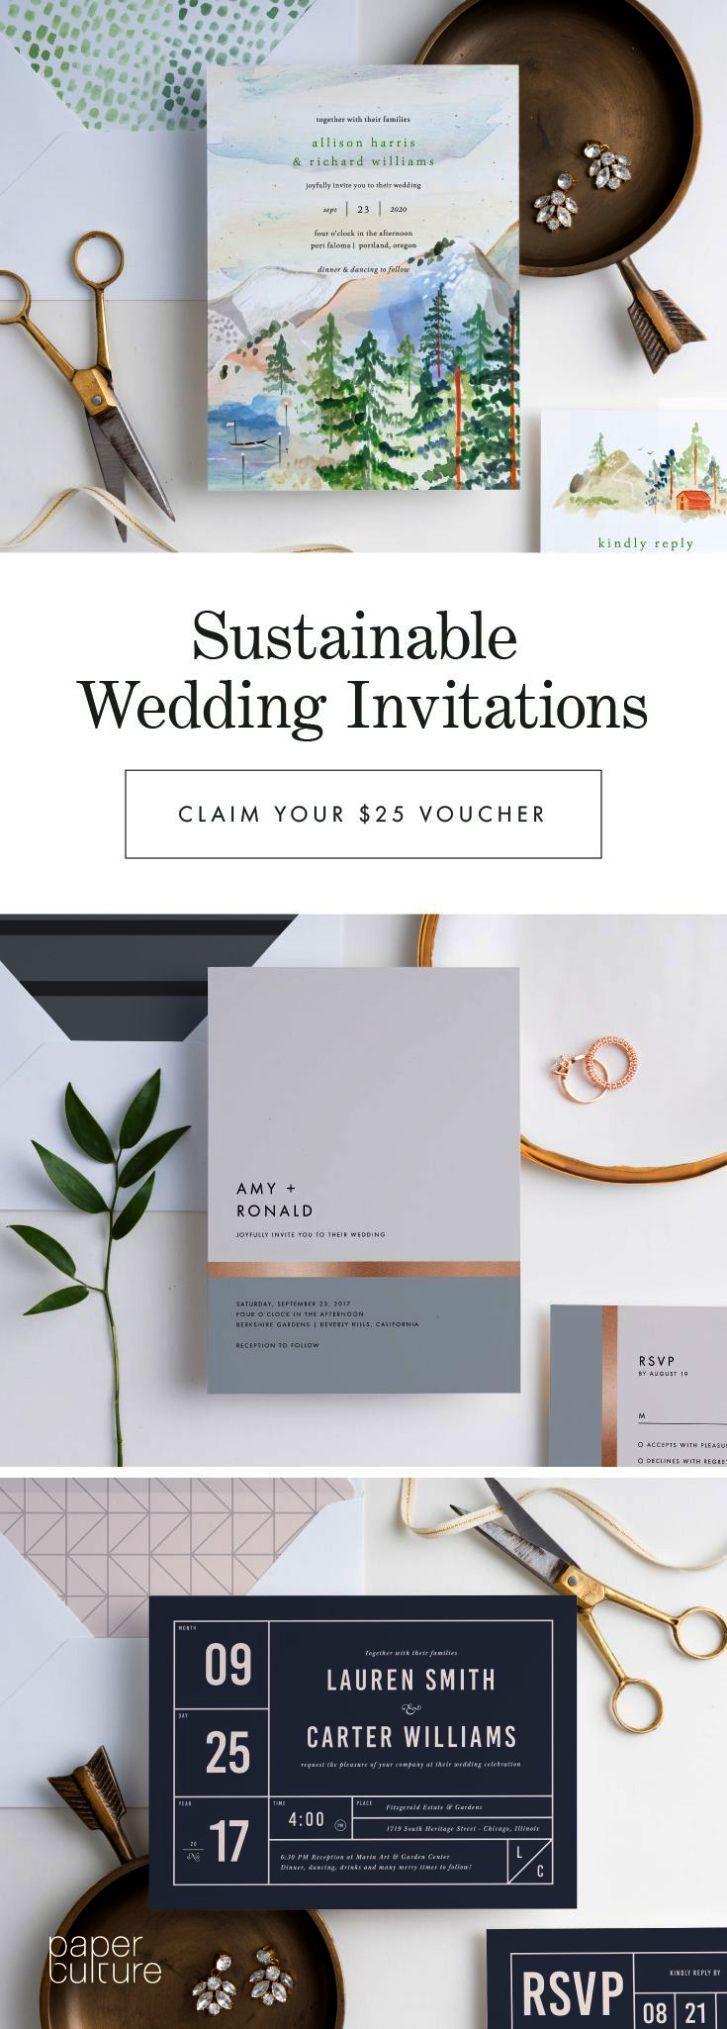 Wedding Invitation Design Digital Behind Wedding Crashers Soundtrack Past Wedding Invitation Design Near Me Wedding Invitations Sustainable Wedding Invitations